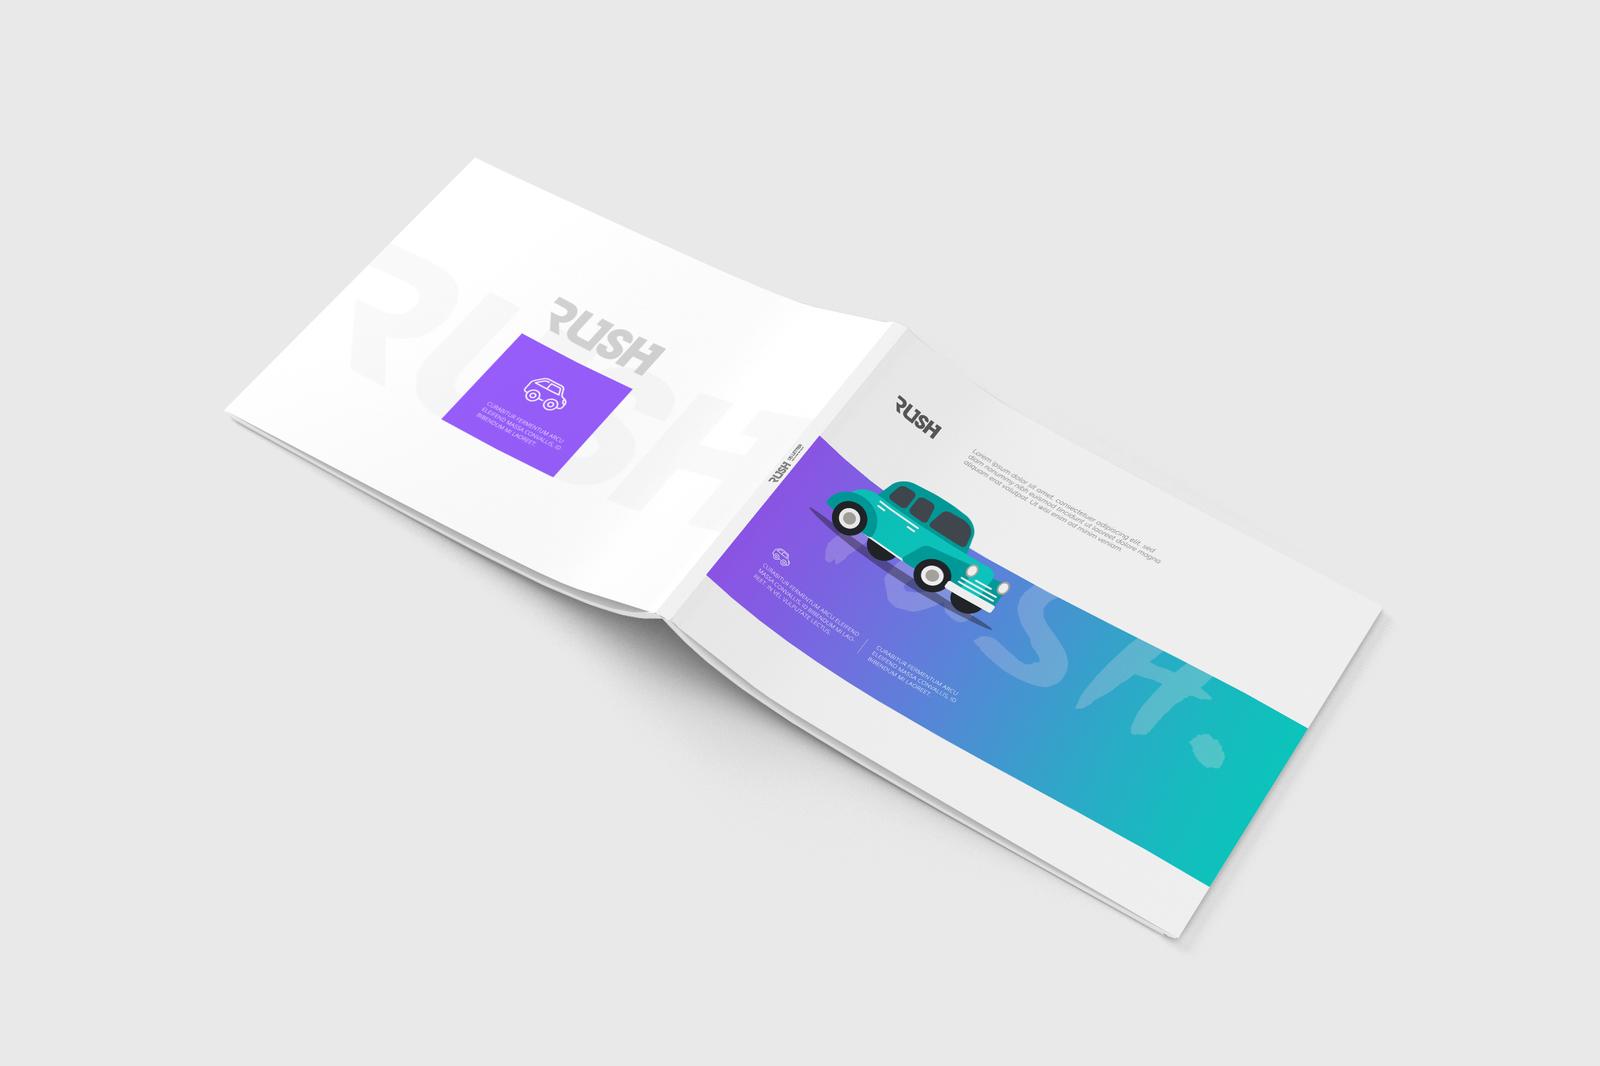 Download Landscape Flyer Mockup Free PSD - Free PSD Mockup Templates